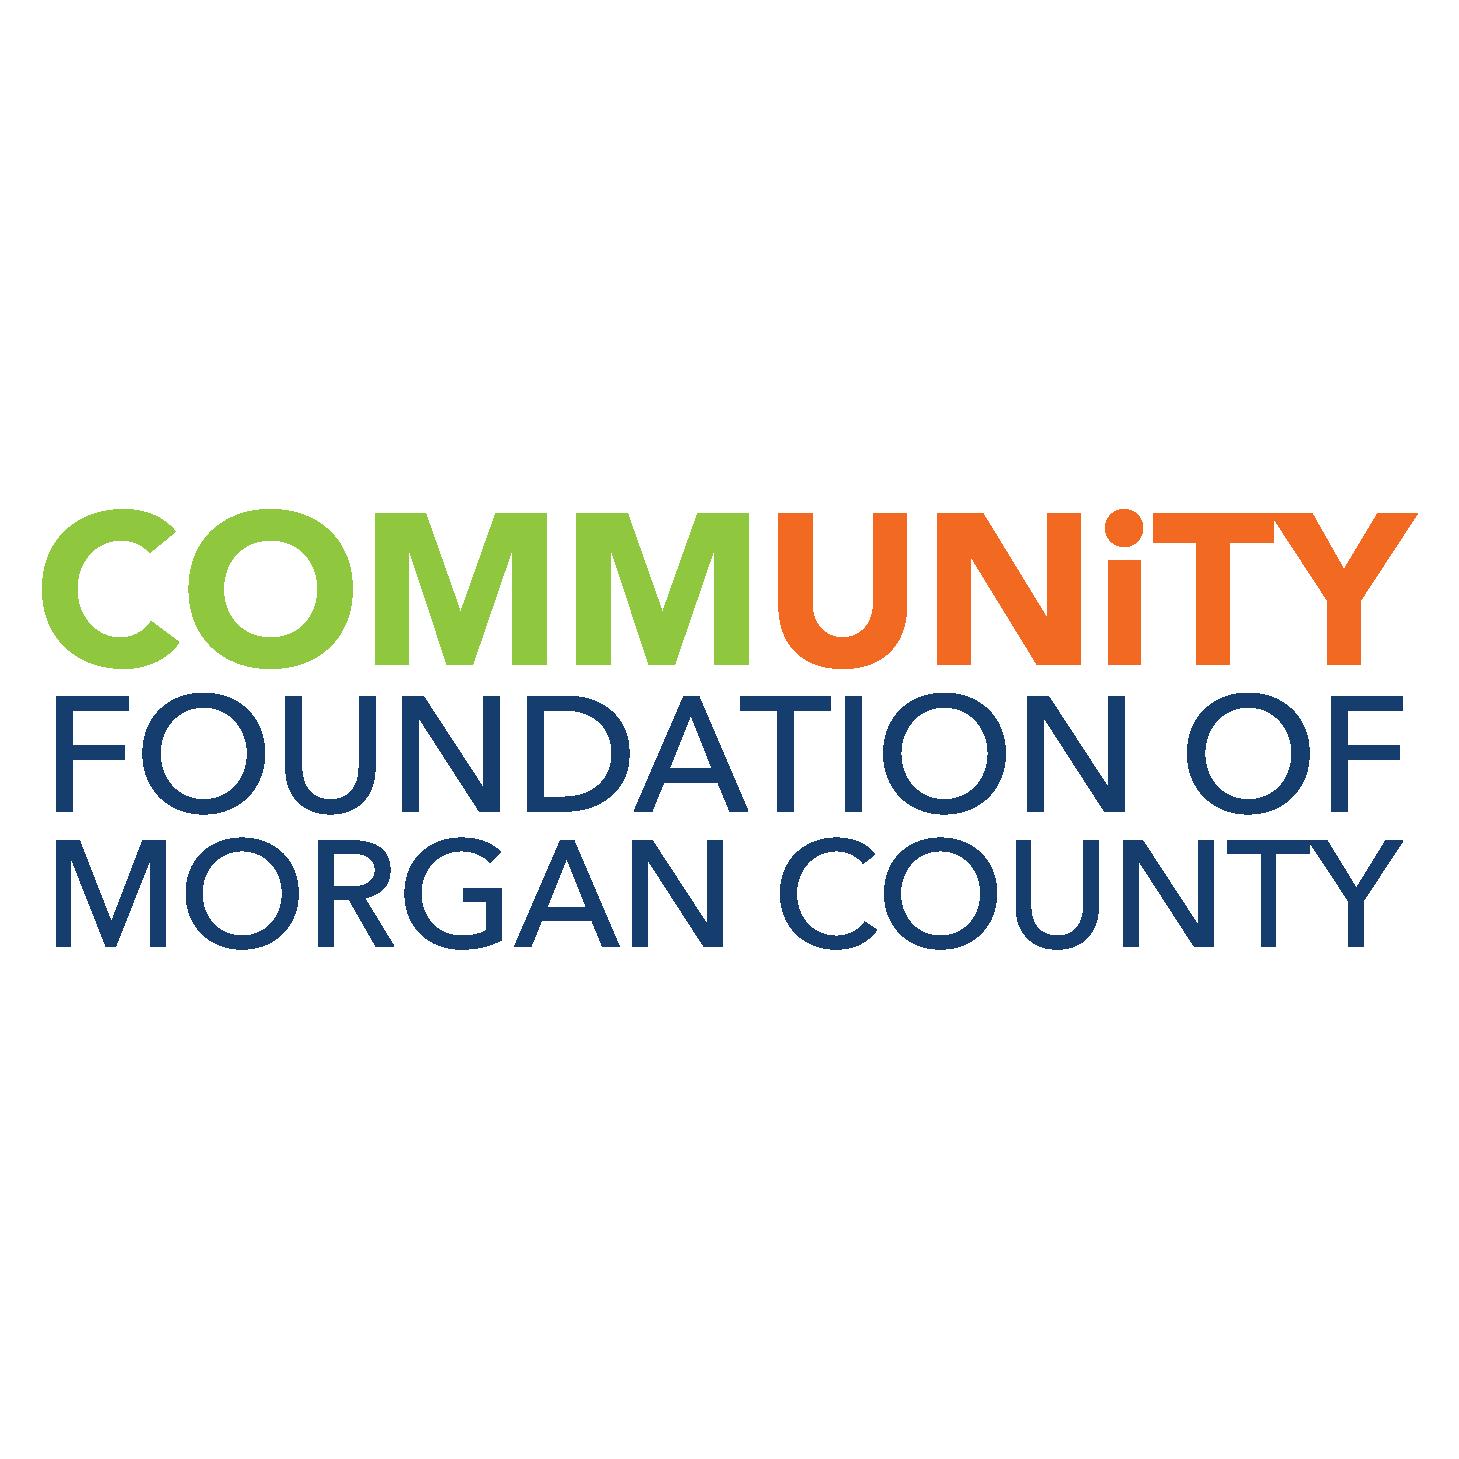 Community Foundation of Morgan County